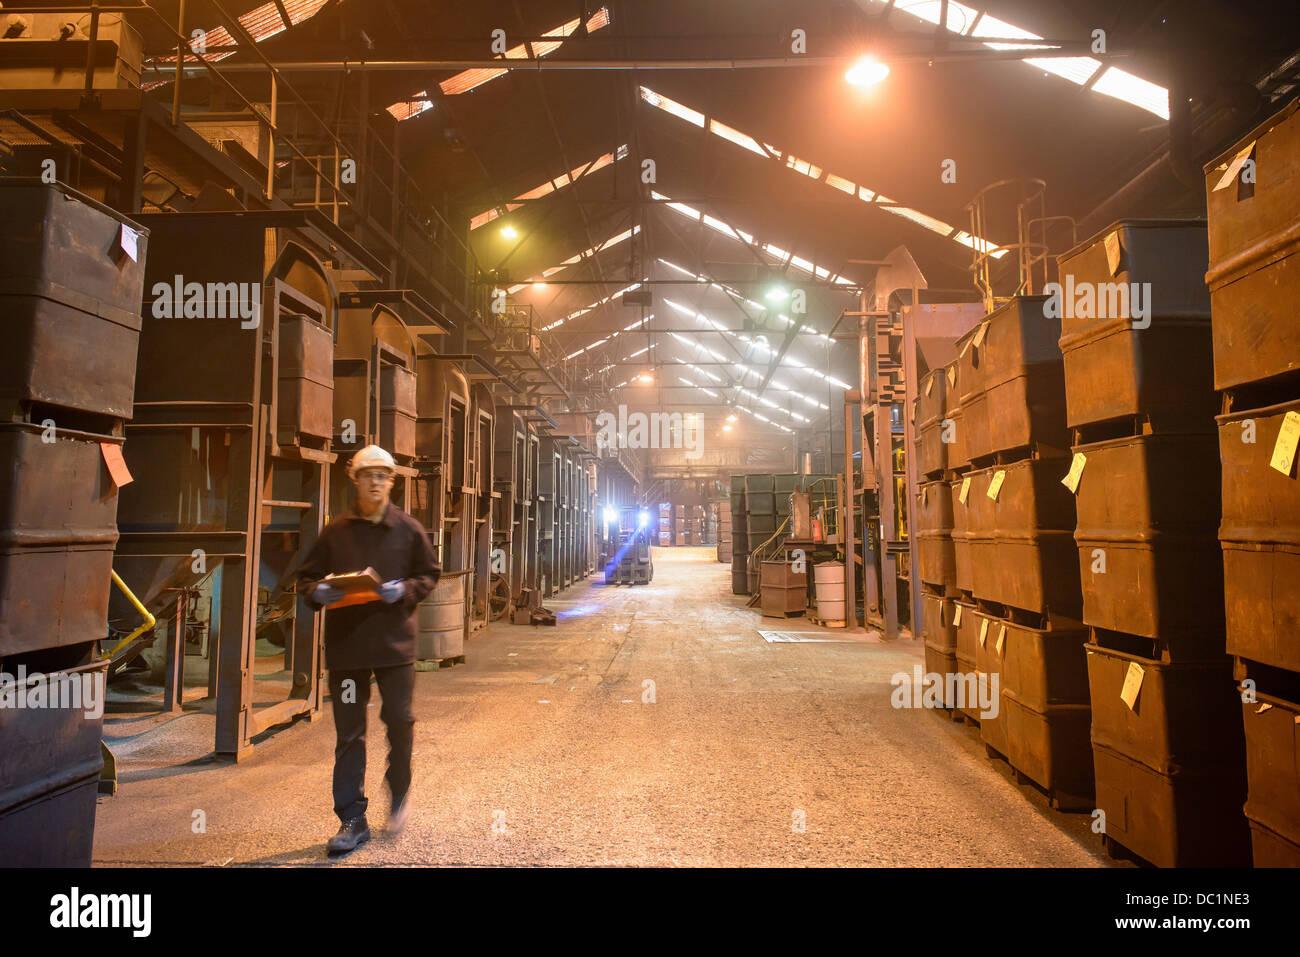 Worker walking past crates of steel shot in steel foundry - Stock Image